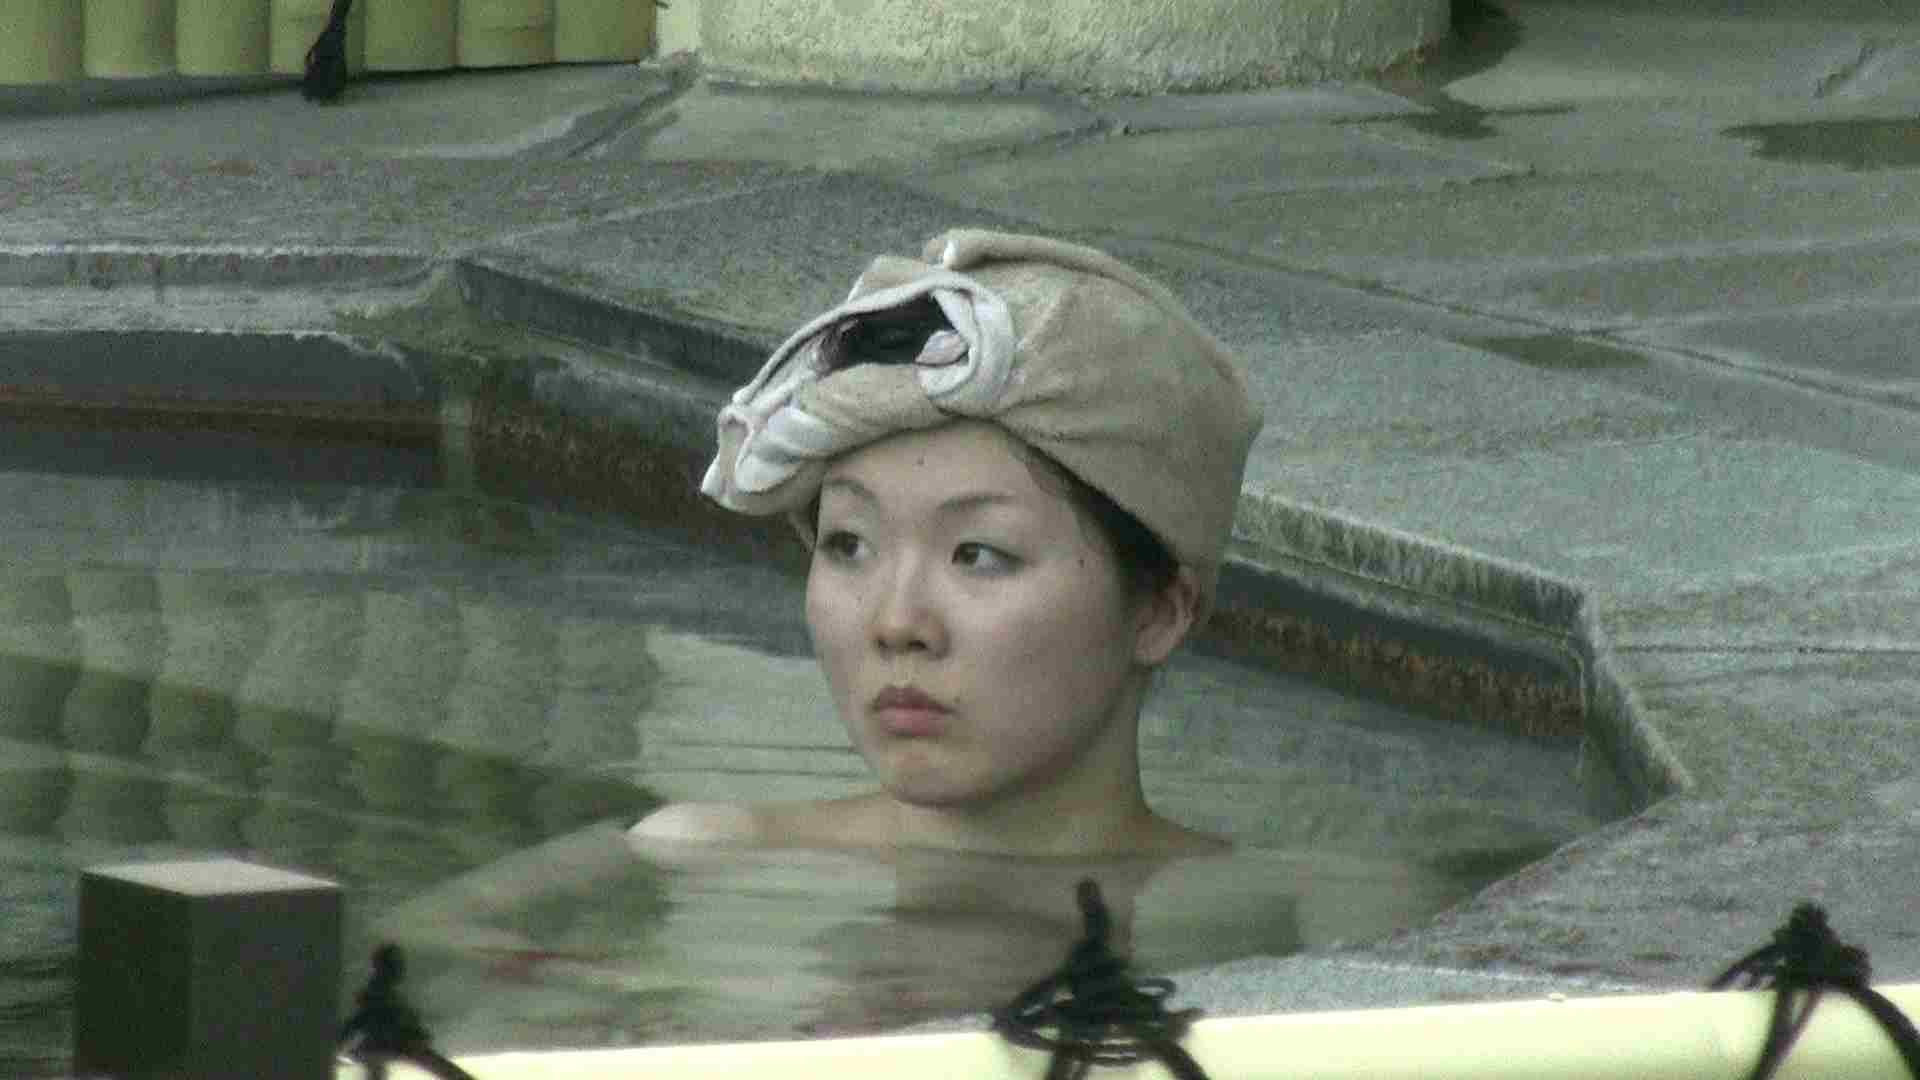 Aquaな露天風呂Vol.191 露天風呂編 | 盗撮シリーズ  104PIX 9